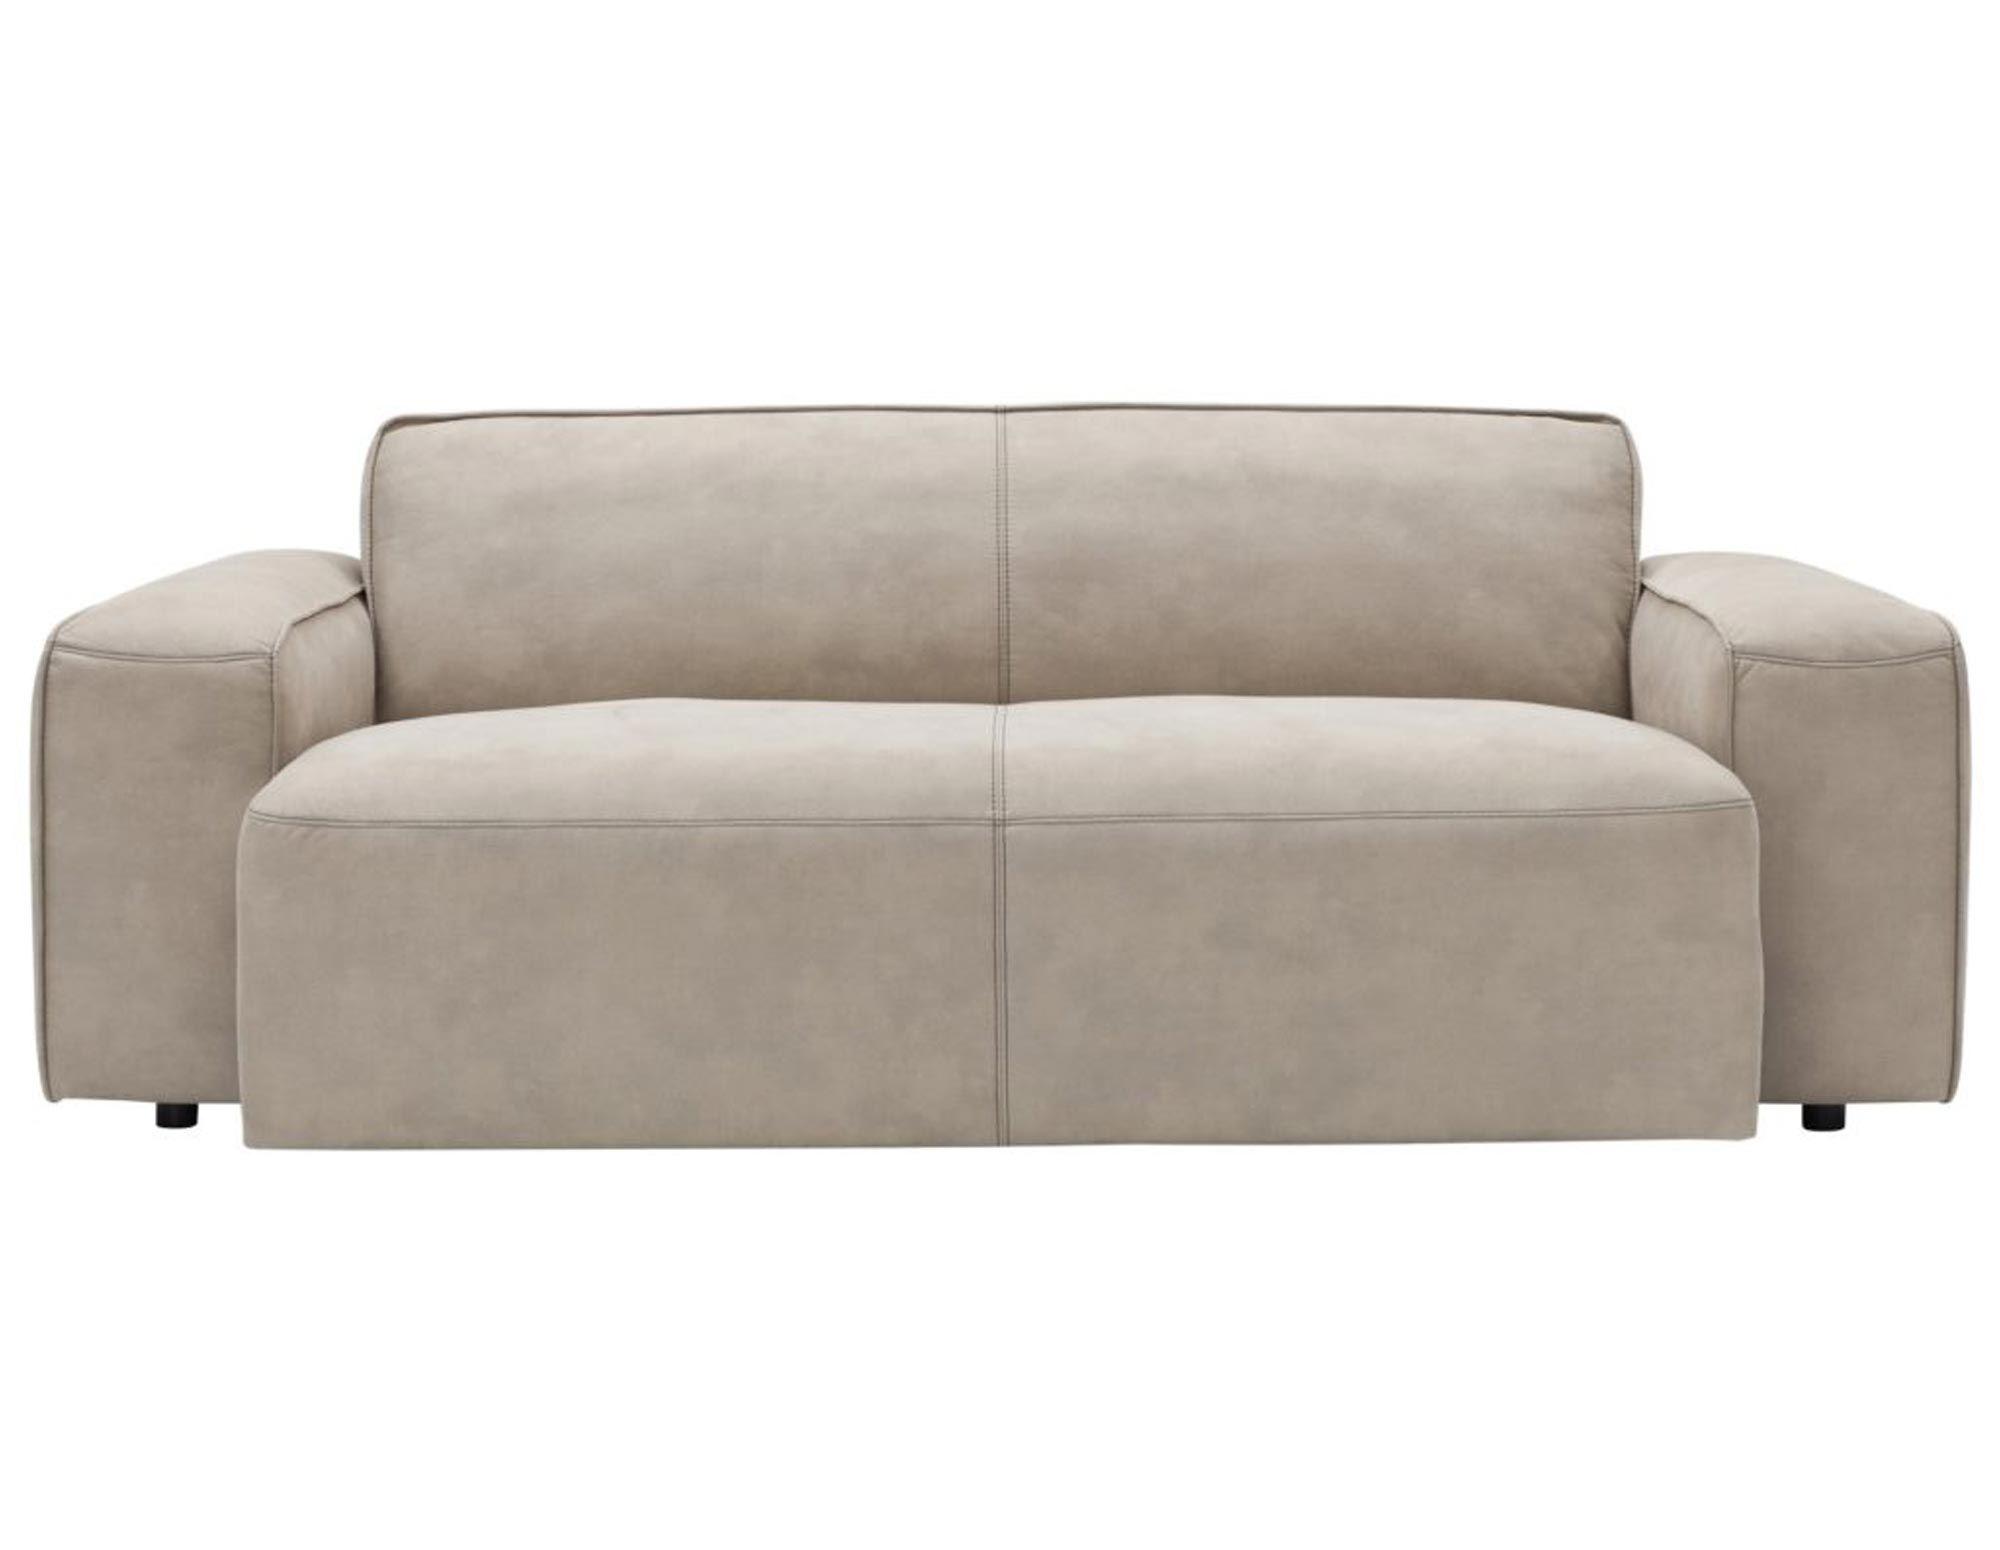 Full Size of Natura Couch Kansas Sofa Brooklyn Home Denver Newport Kaufen Livingston Pasadena 19 Mbel Inspirierend Ebay Leinen Kare Mega Xxl Günstig Türkische Altes Sofa Natura Sofa